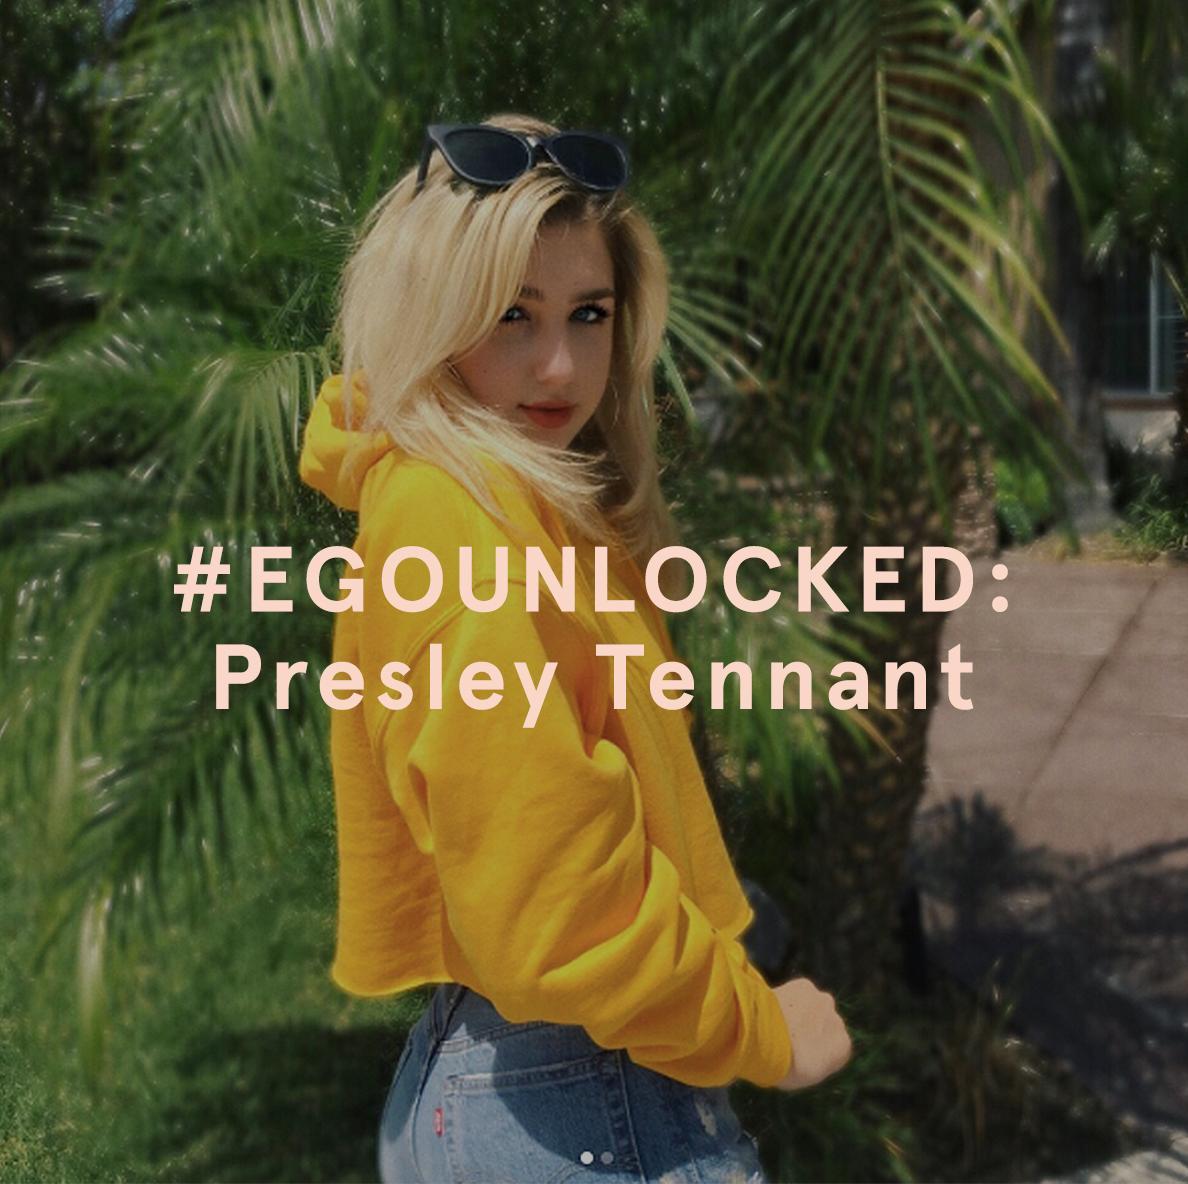 Presley Tennant